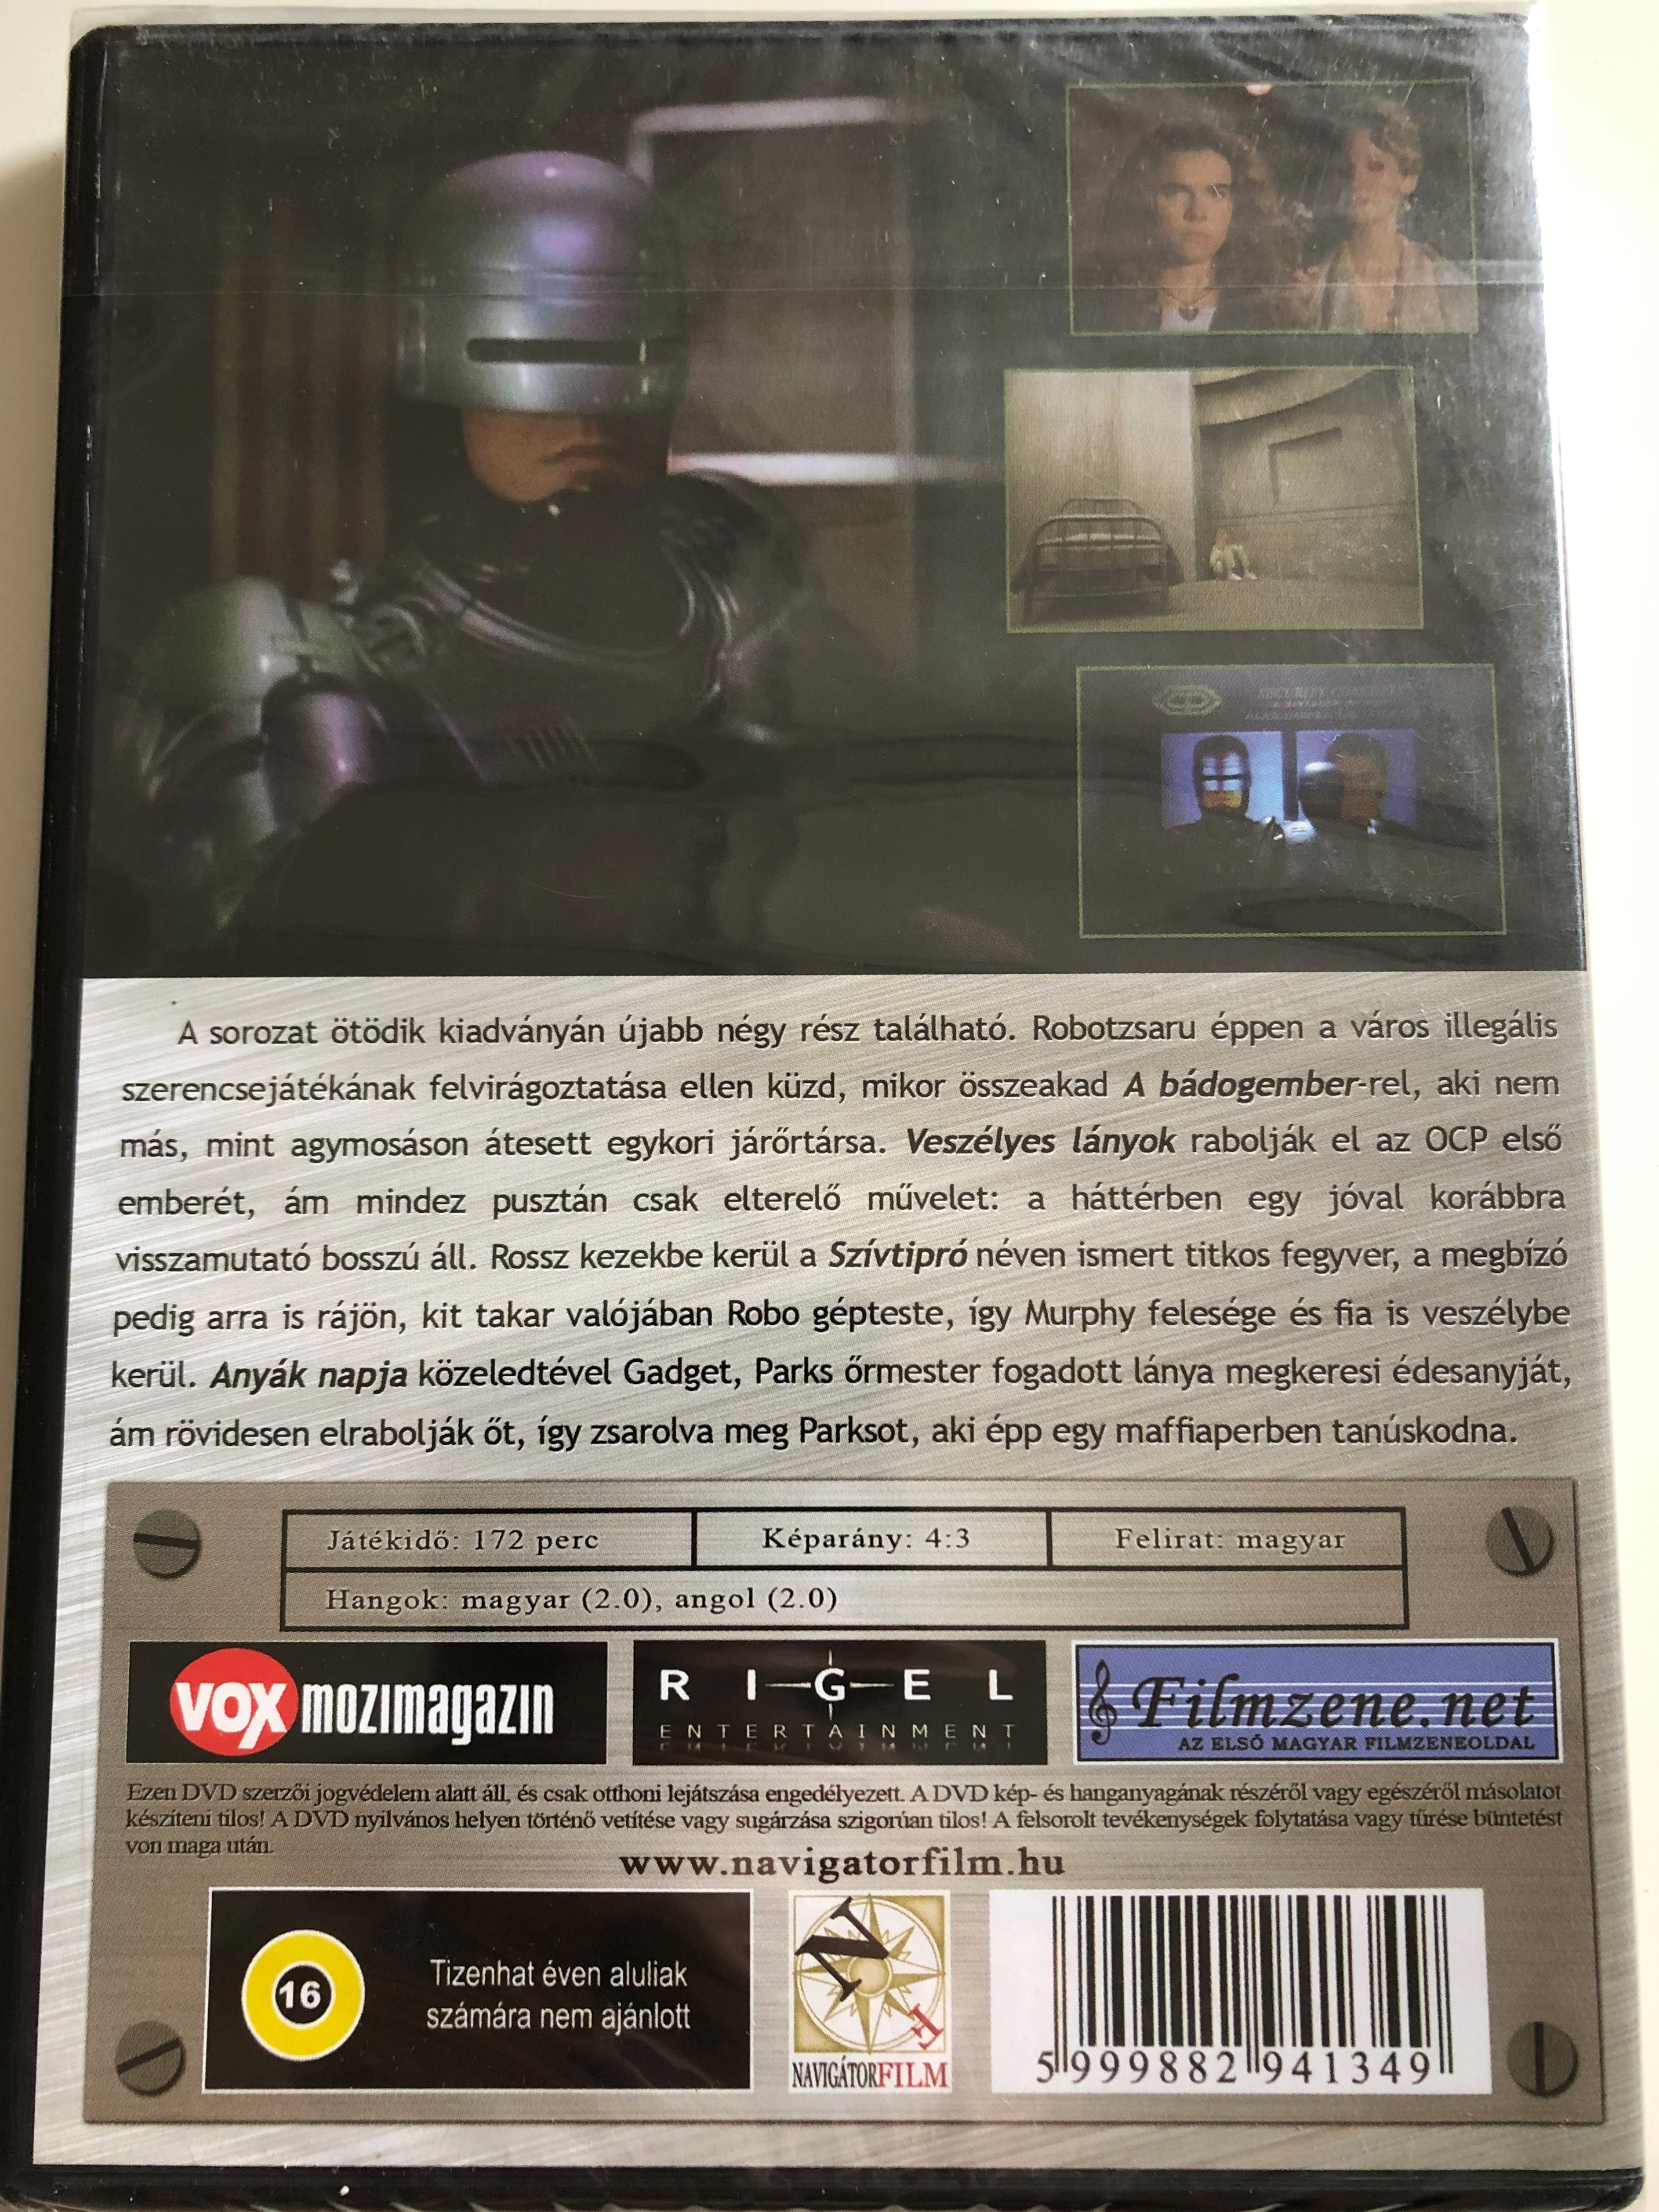 robocop-dvd-1994-robotzsaru-tv-series-created-by-michael-miner-edward-neumeier-starring-richard-eden-yvette-nipar-disc-5-4-episodes-2-.jpg